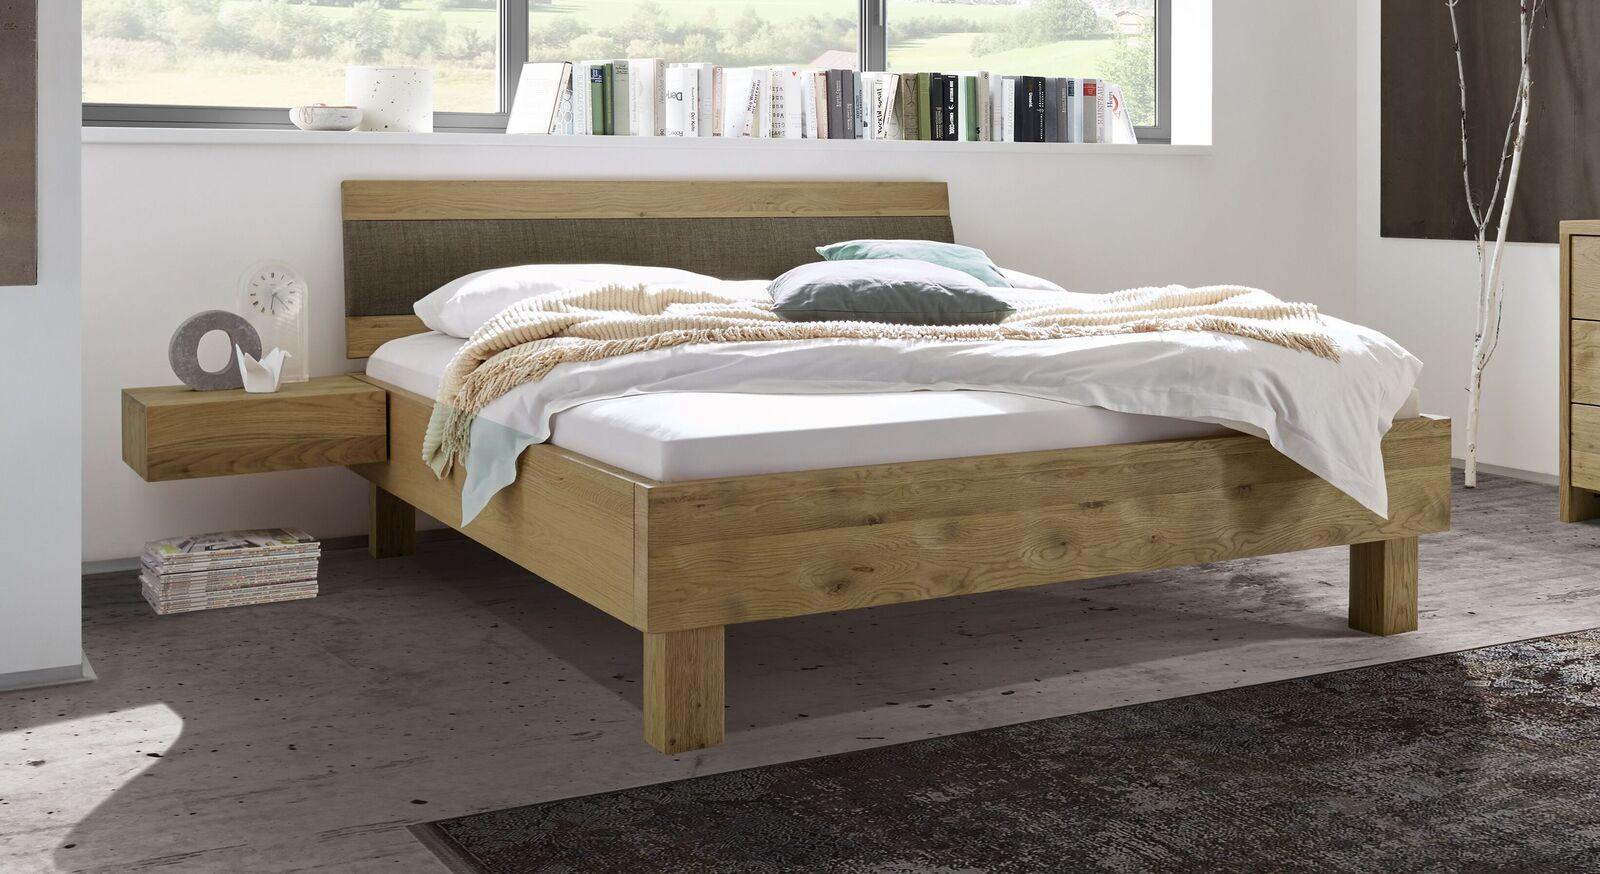 Bett Karvel mit rustikaler Relief-Oberfläche